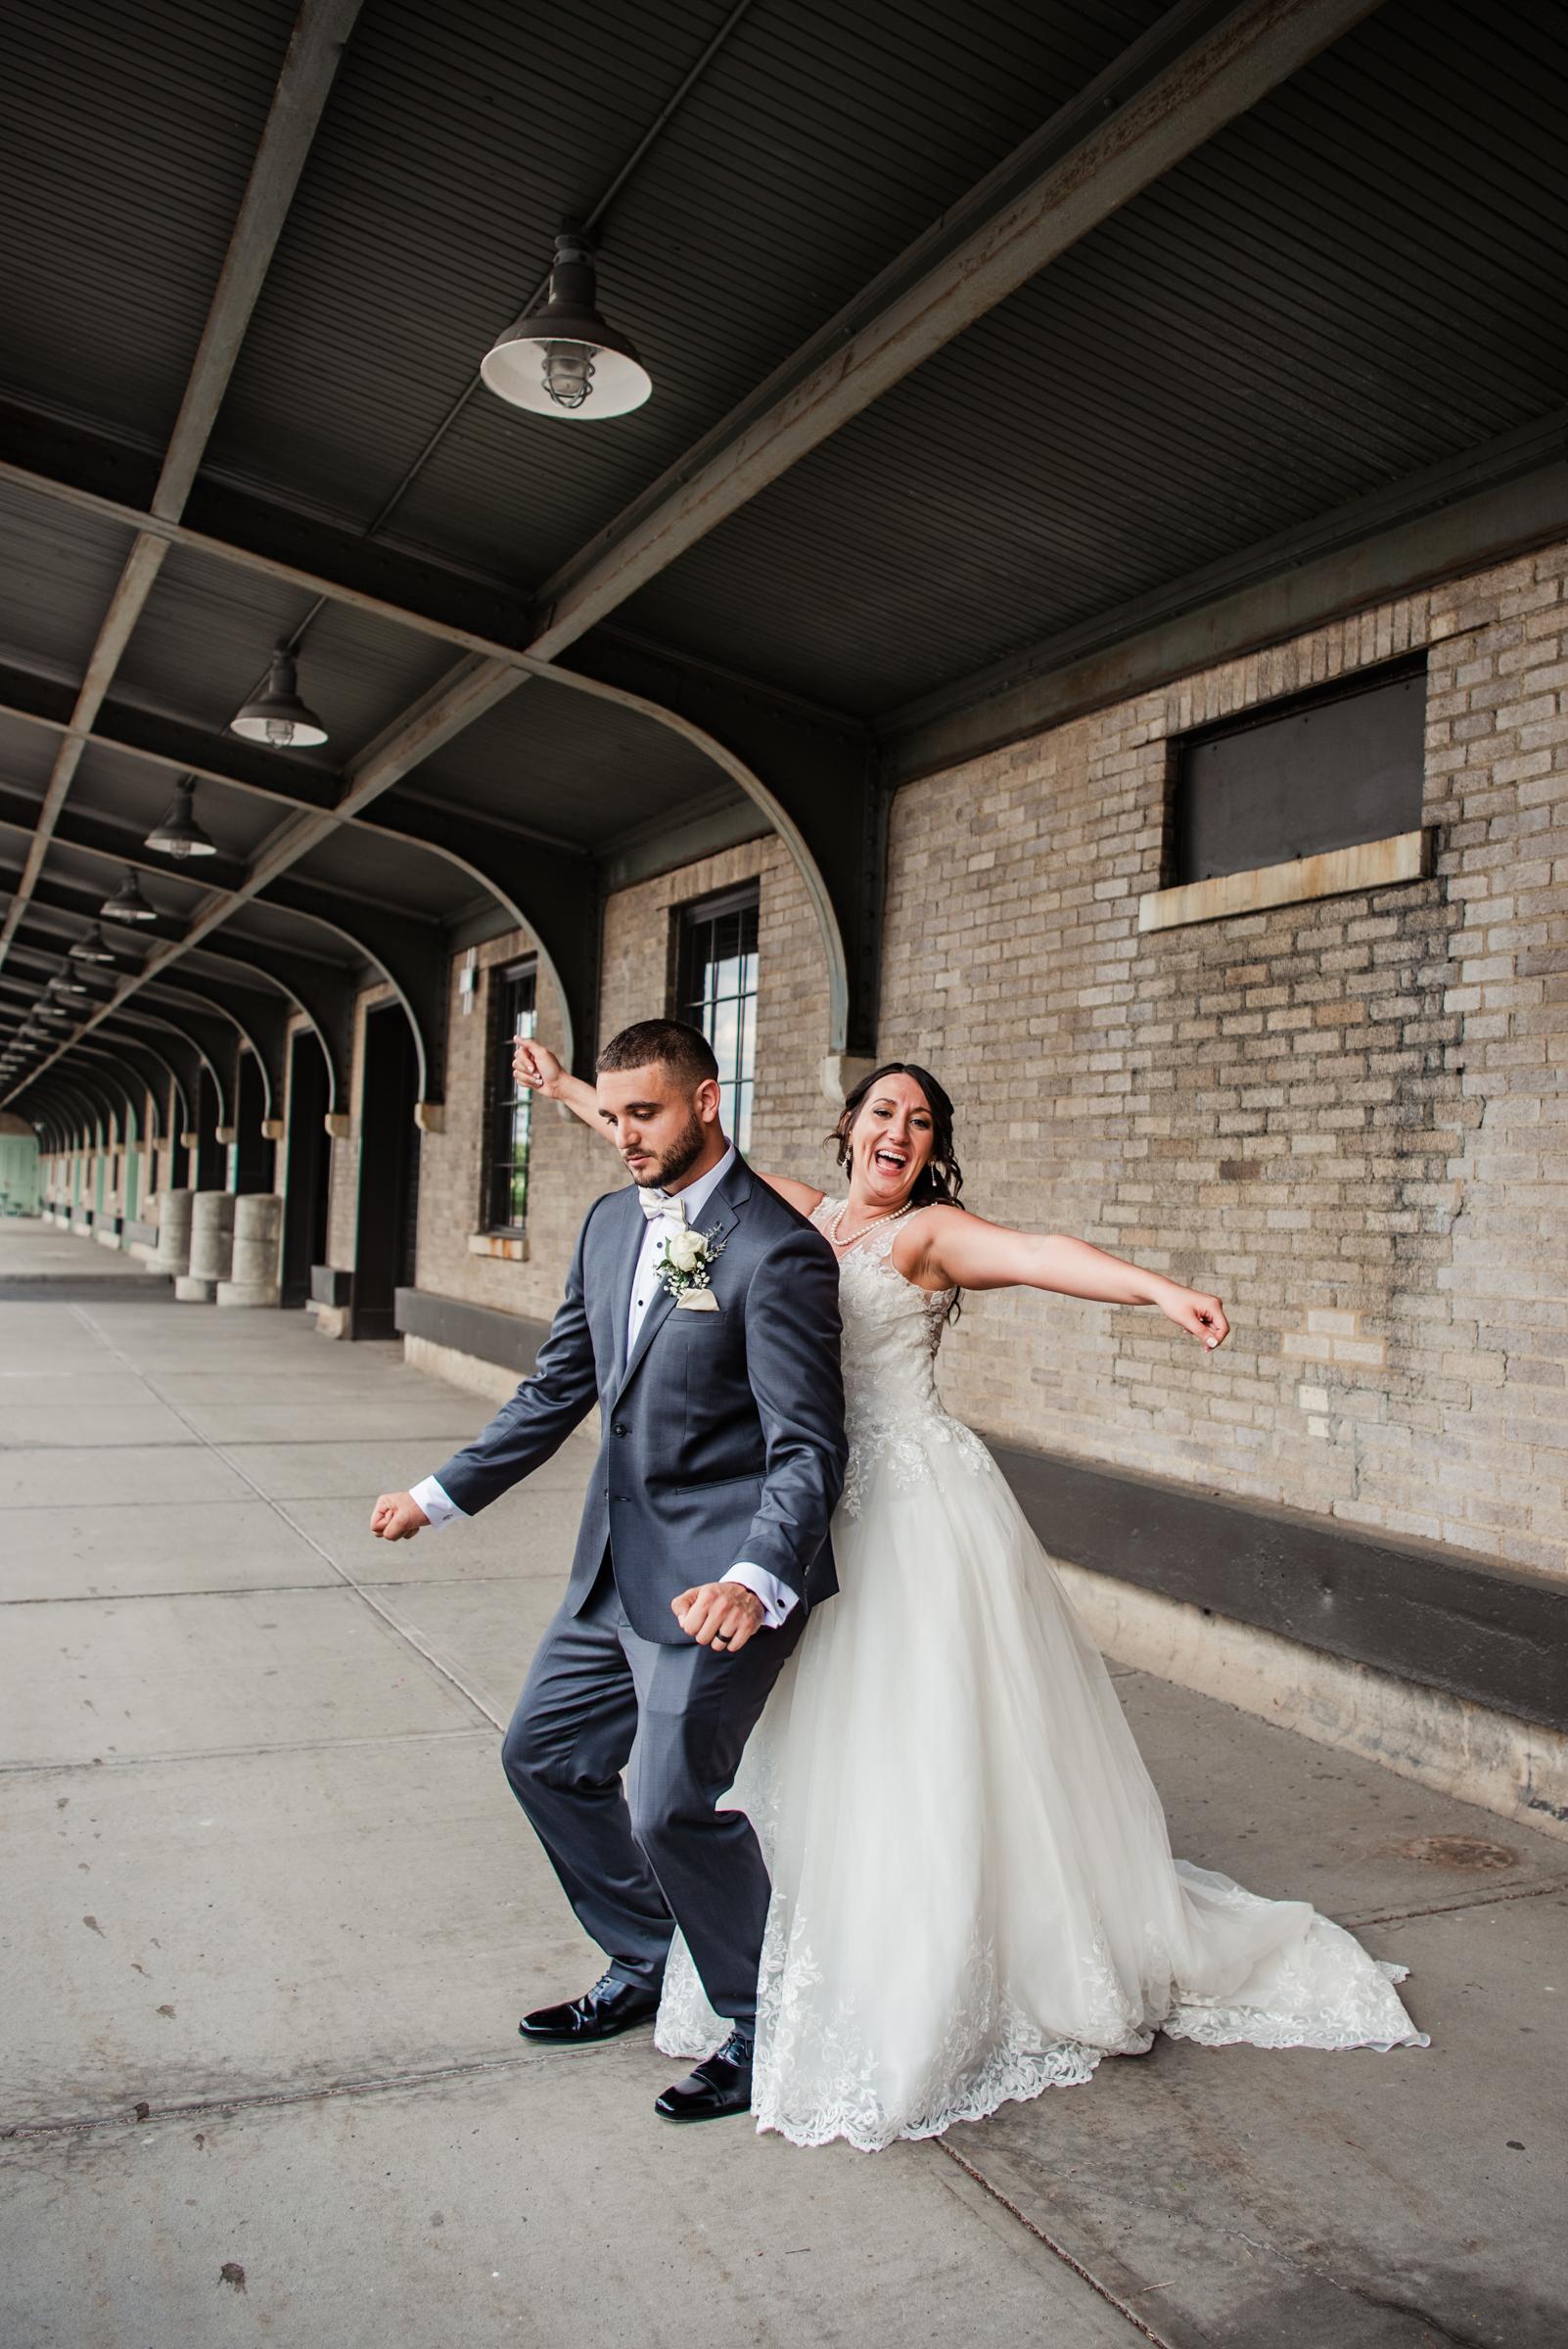 Historic_Old_St_Johns_Church_Valentinos_Banquet_Hall_Central_NY_Wedding_JILL_STUDIO_Rochester_NY_Photographer_DSC_6381.jpg